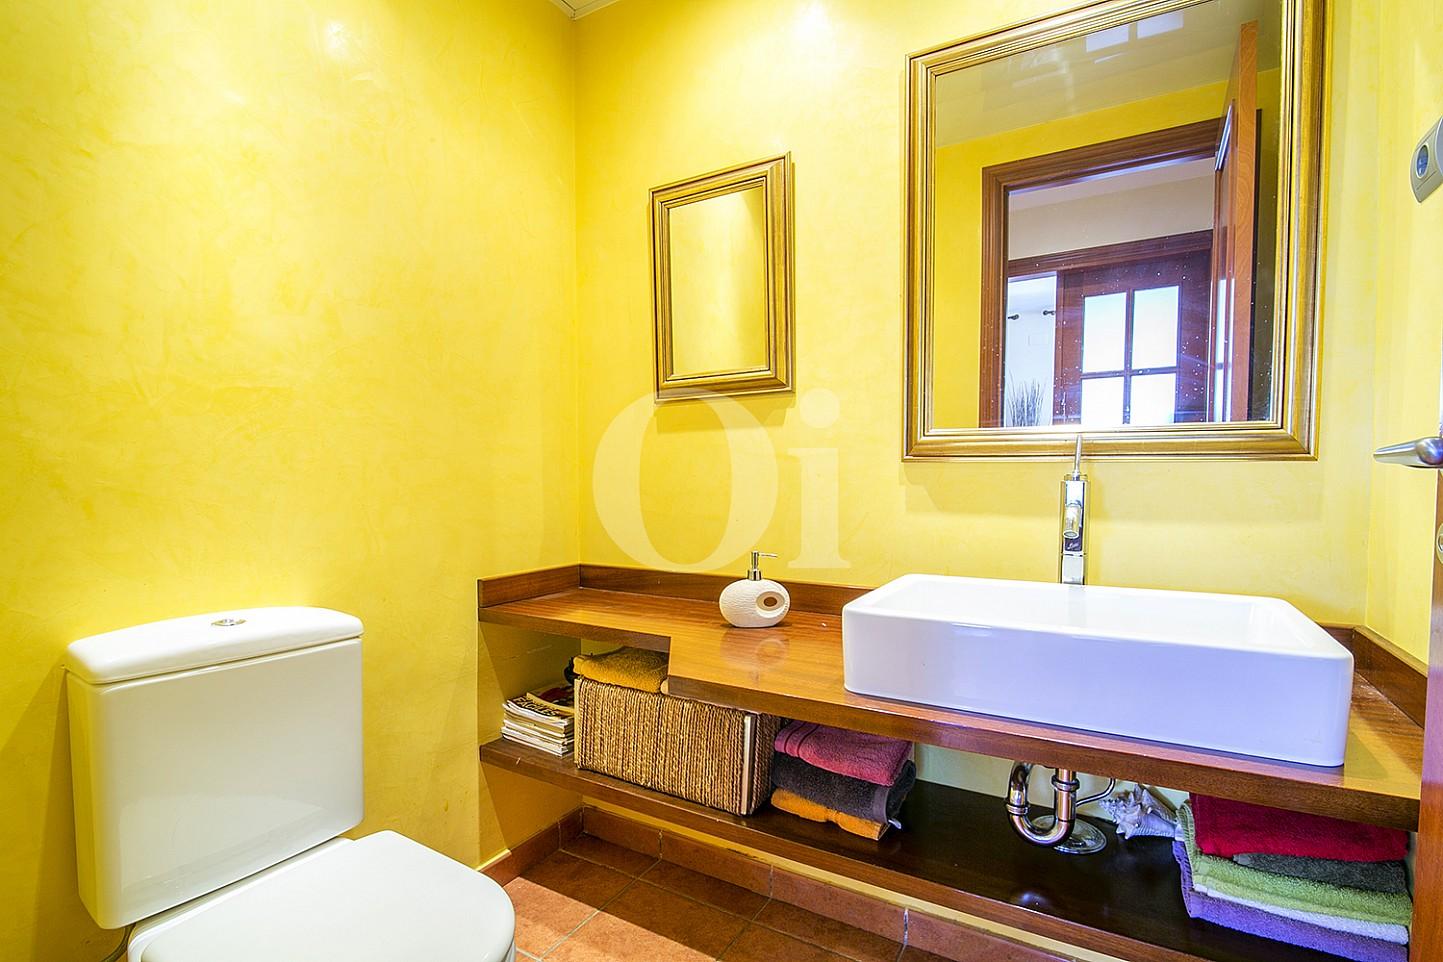 Baño de maravillosa casa en venta en Mongat, Maresme